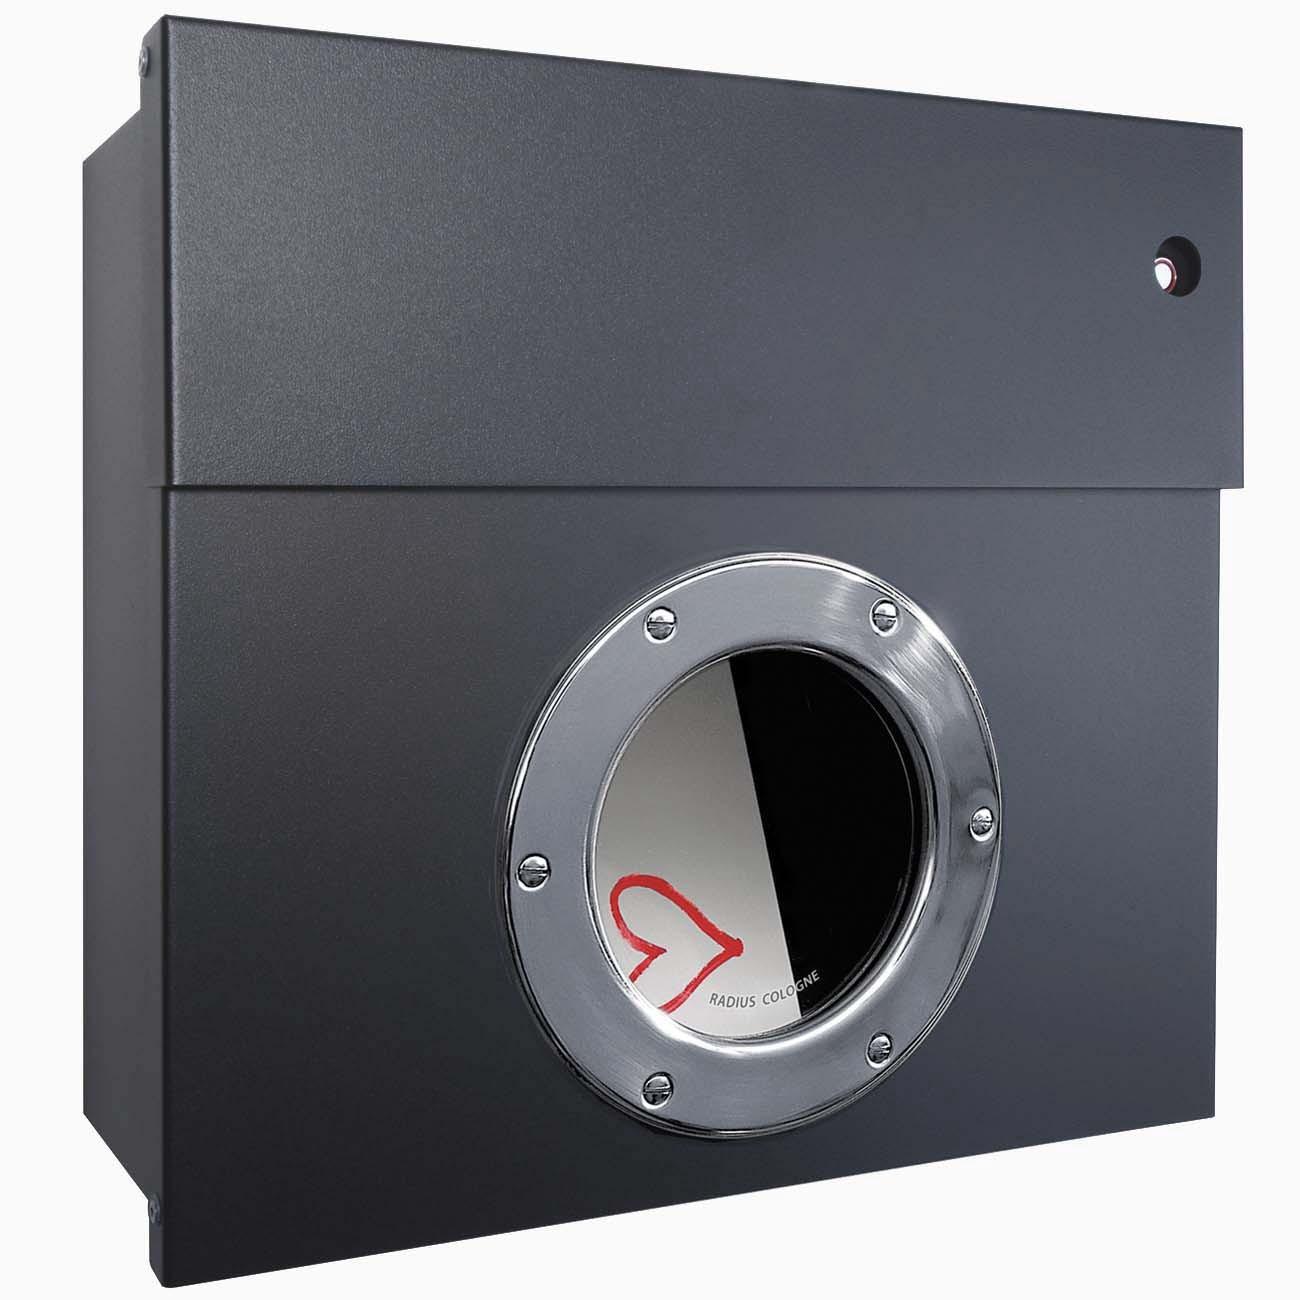 briefkasten letterman 1 anthrazitgrau ral 7016 mit bullauge klingel rot radius ebay. Black Bedroom Furniture Sets. Home Design Ideas